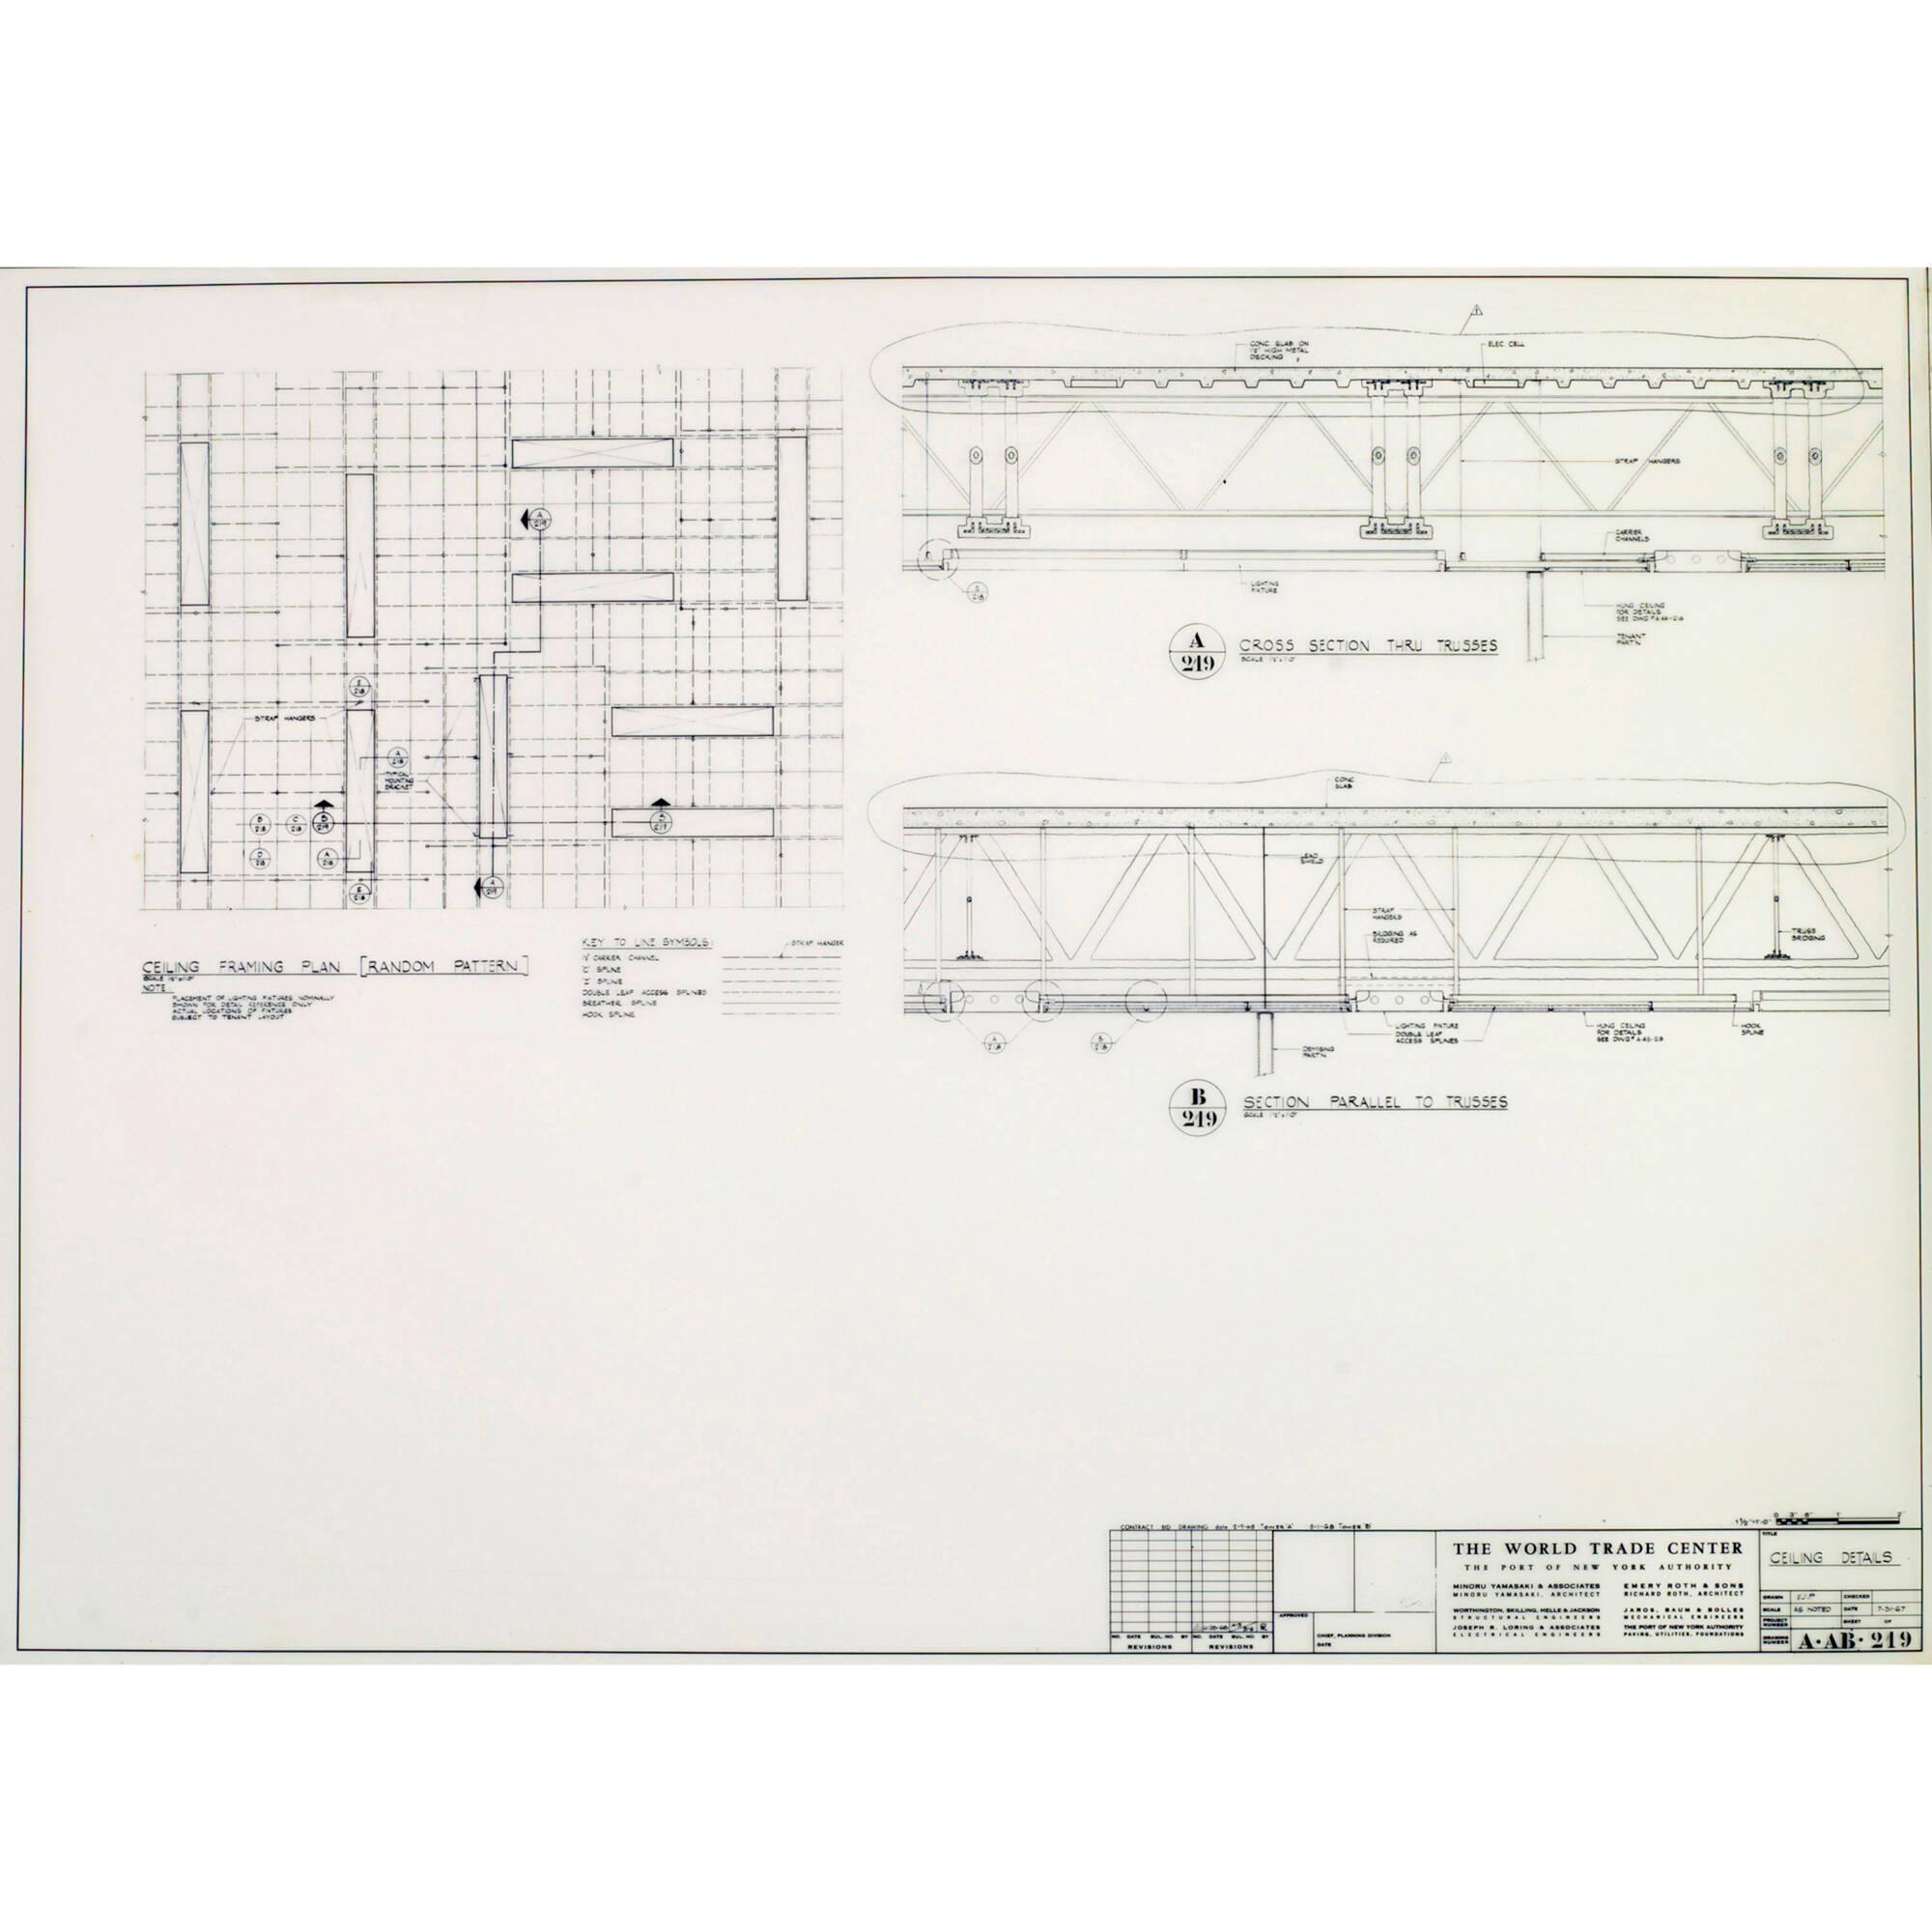 medium resolution of 500 minoru yamasaki associates world trade center north tower ceiling details